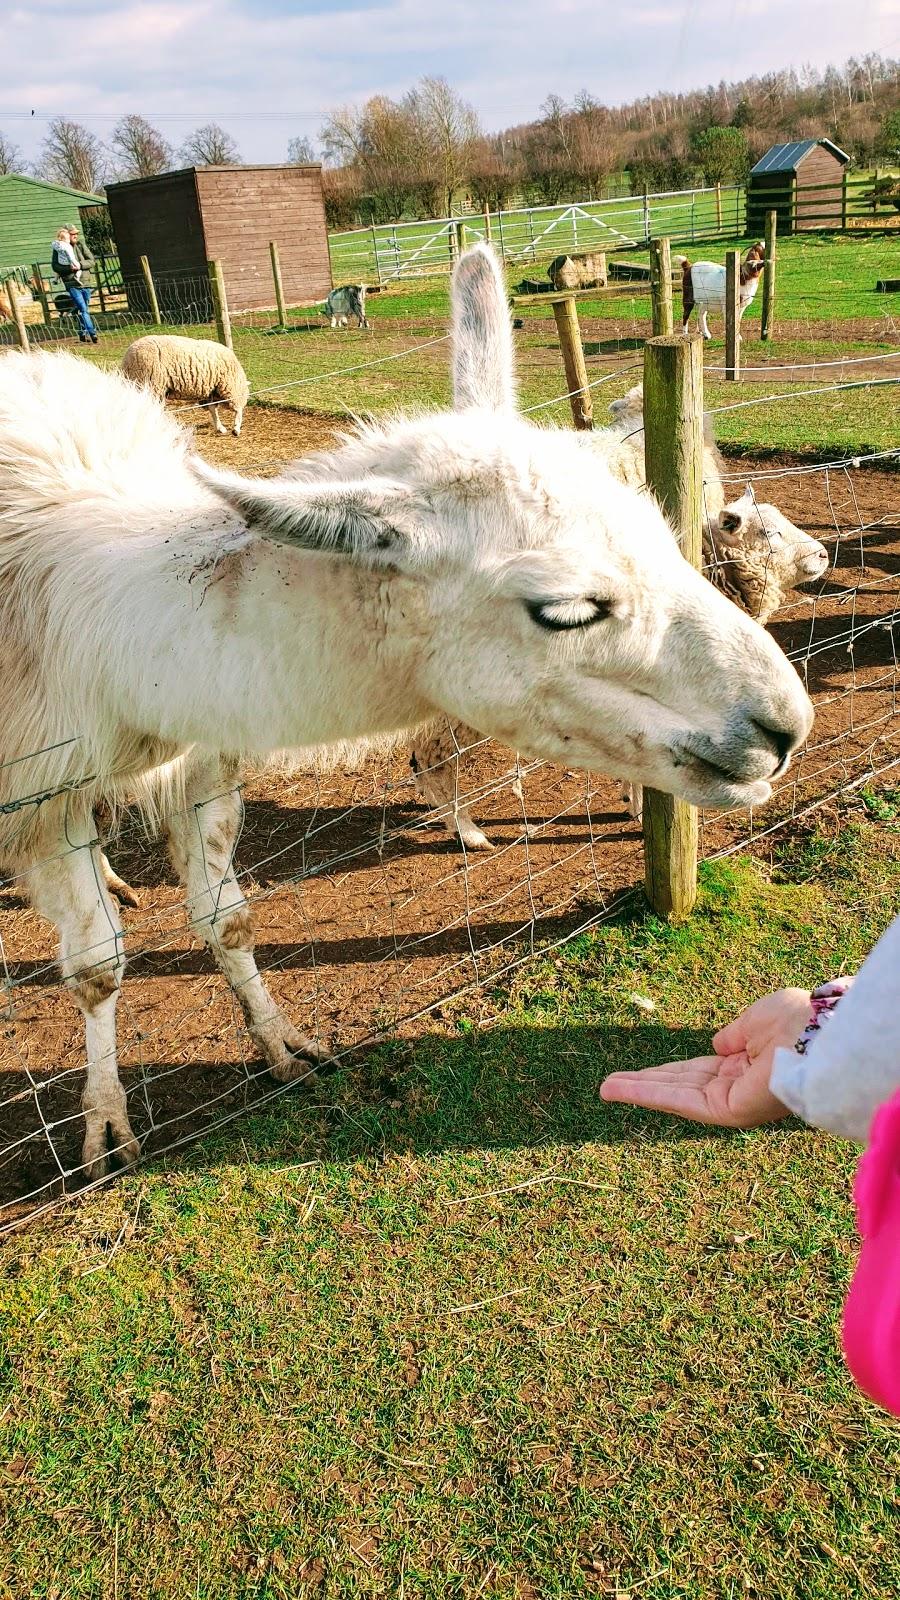 No Drama Llama: But First Llama Take A Selfie